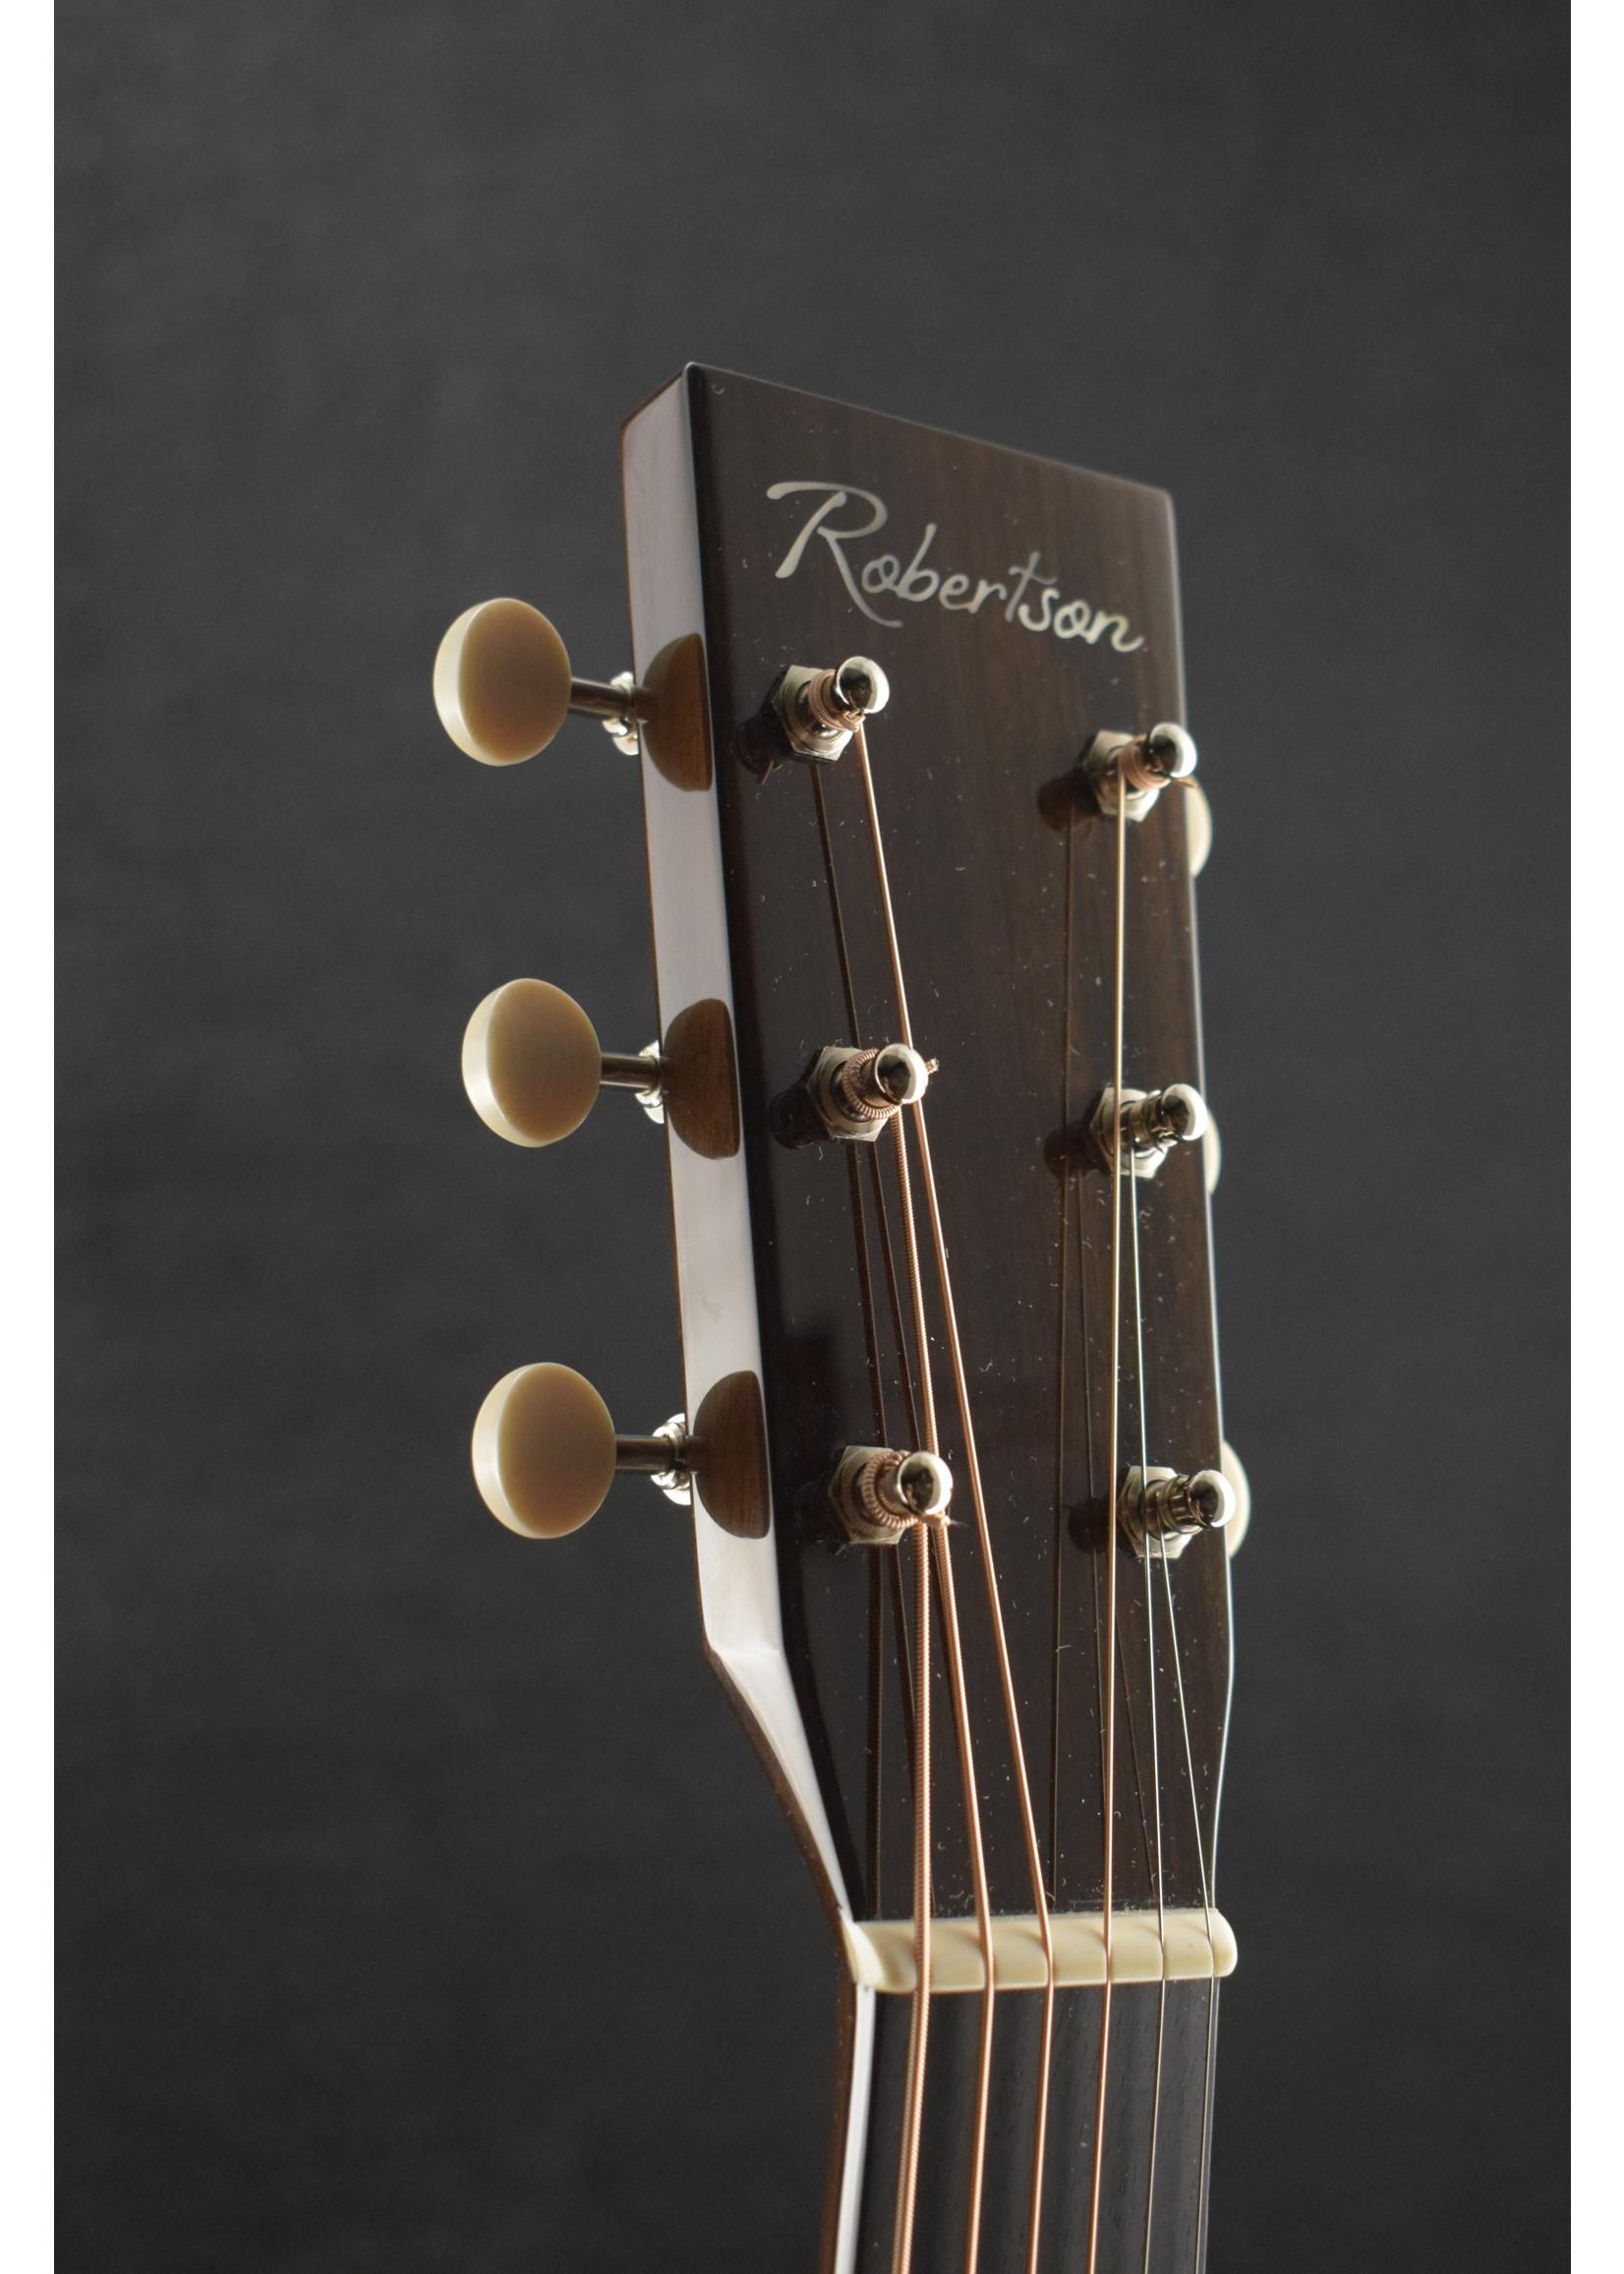 Robertson Robertson D-40 Toriffied Sitka/Wenge with K&K Pure Mini